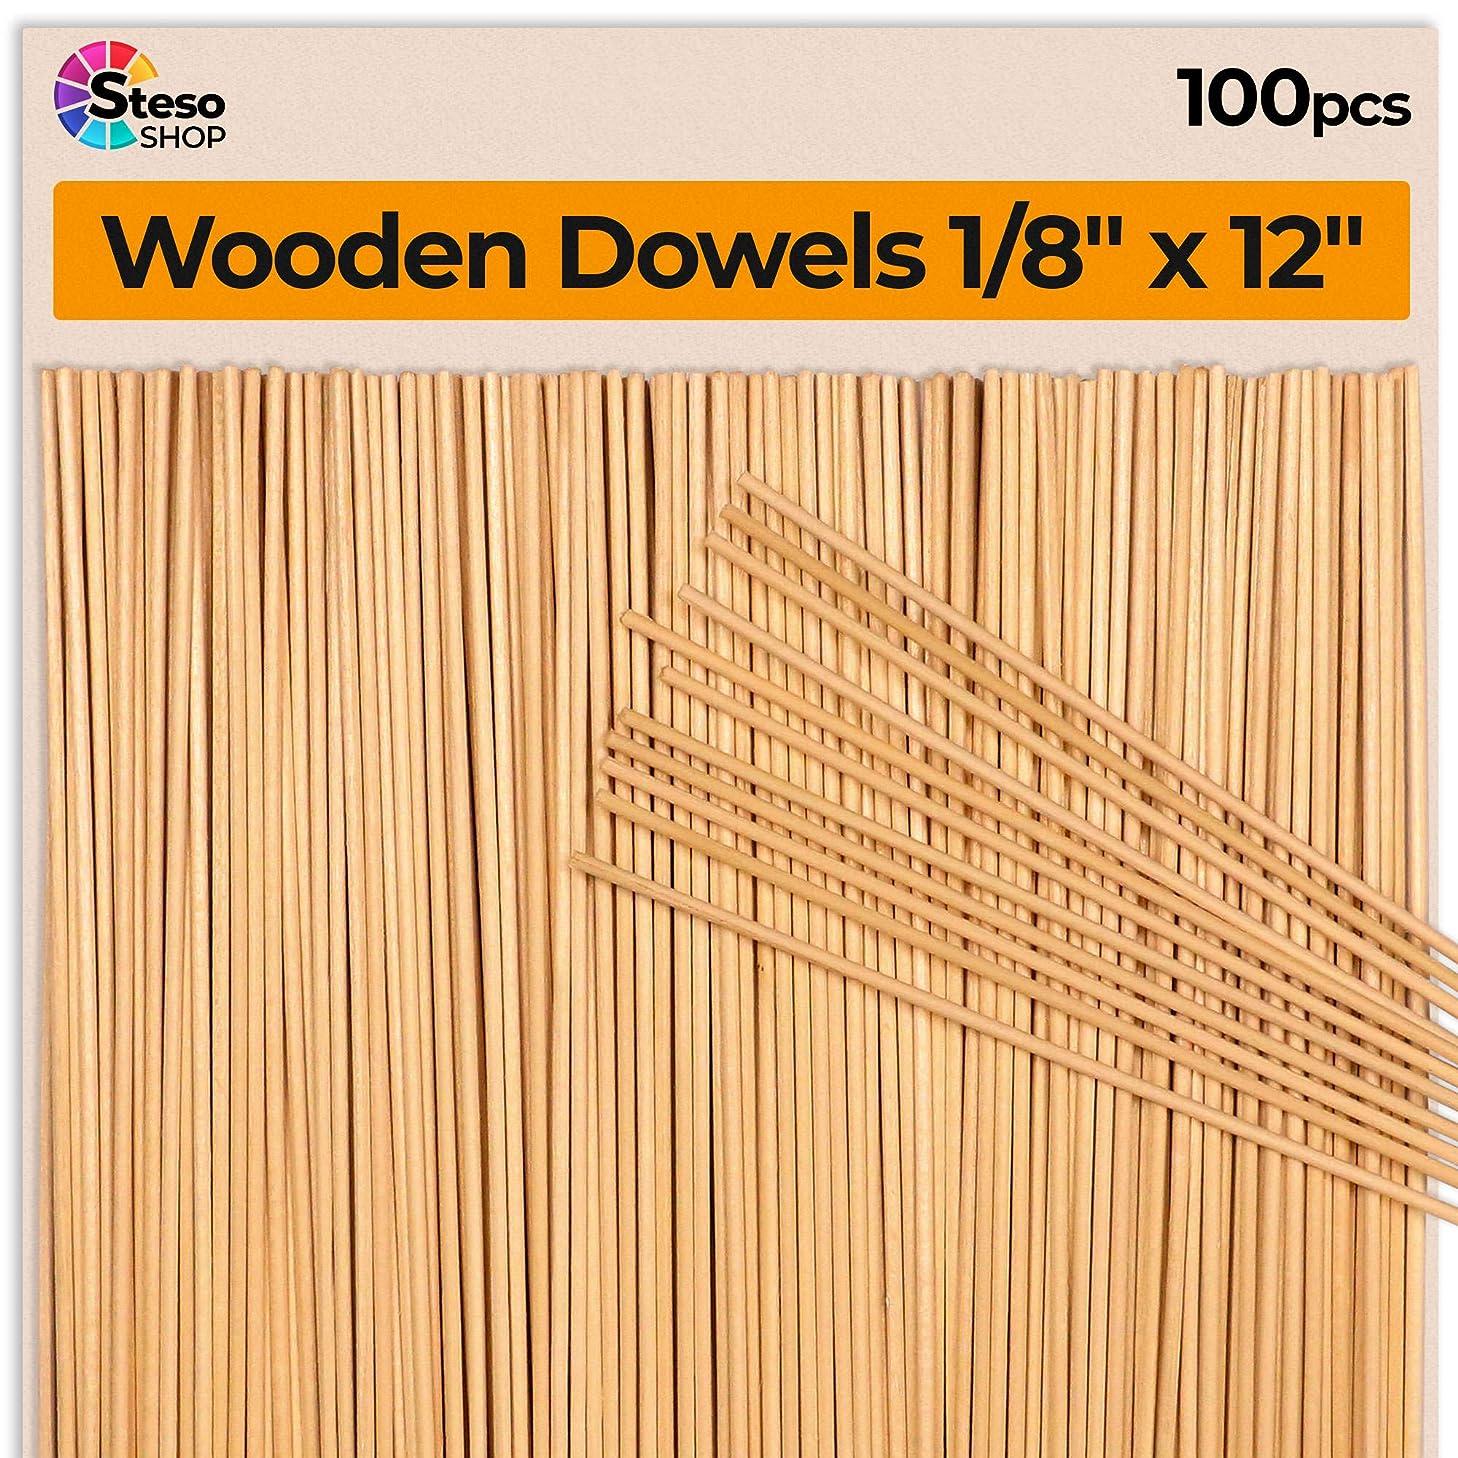 Dowel Rods 1/8 - Wooden Dowels 12 inch (30cm-3mm?) - 100 PCS - Thin Wooden Dowels for Crafts - Wood Dowel Model Building, Kids Crafts, Wedding Ribbon Wands, Events